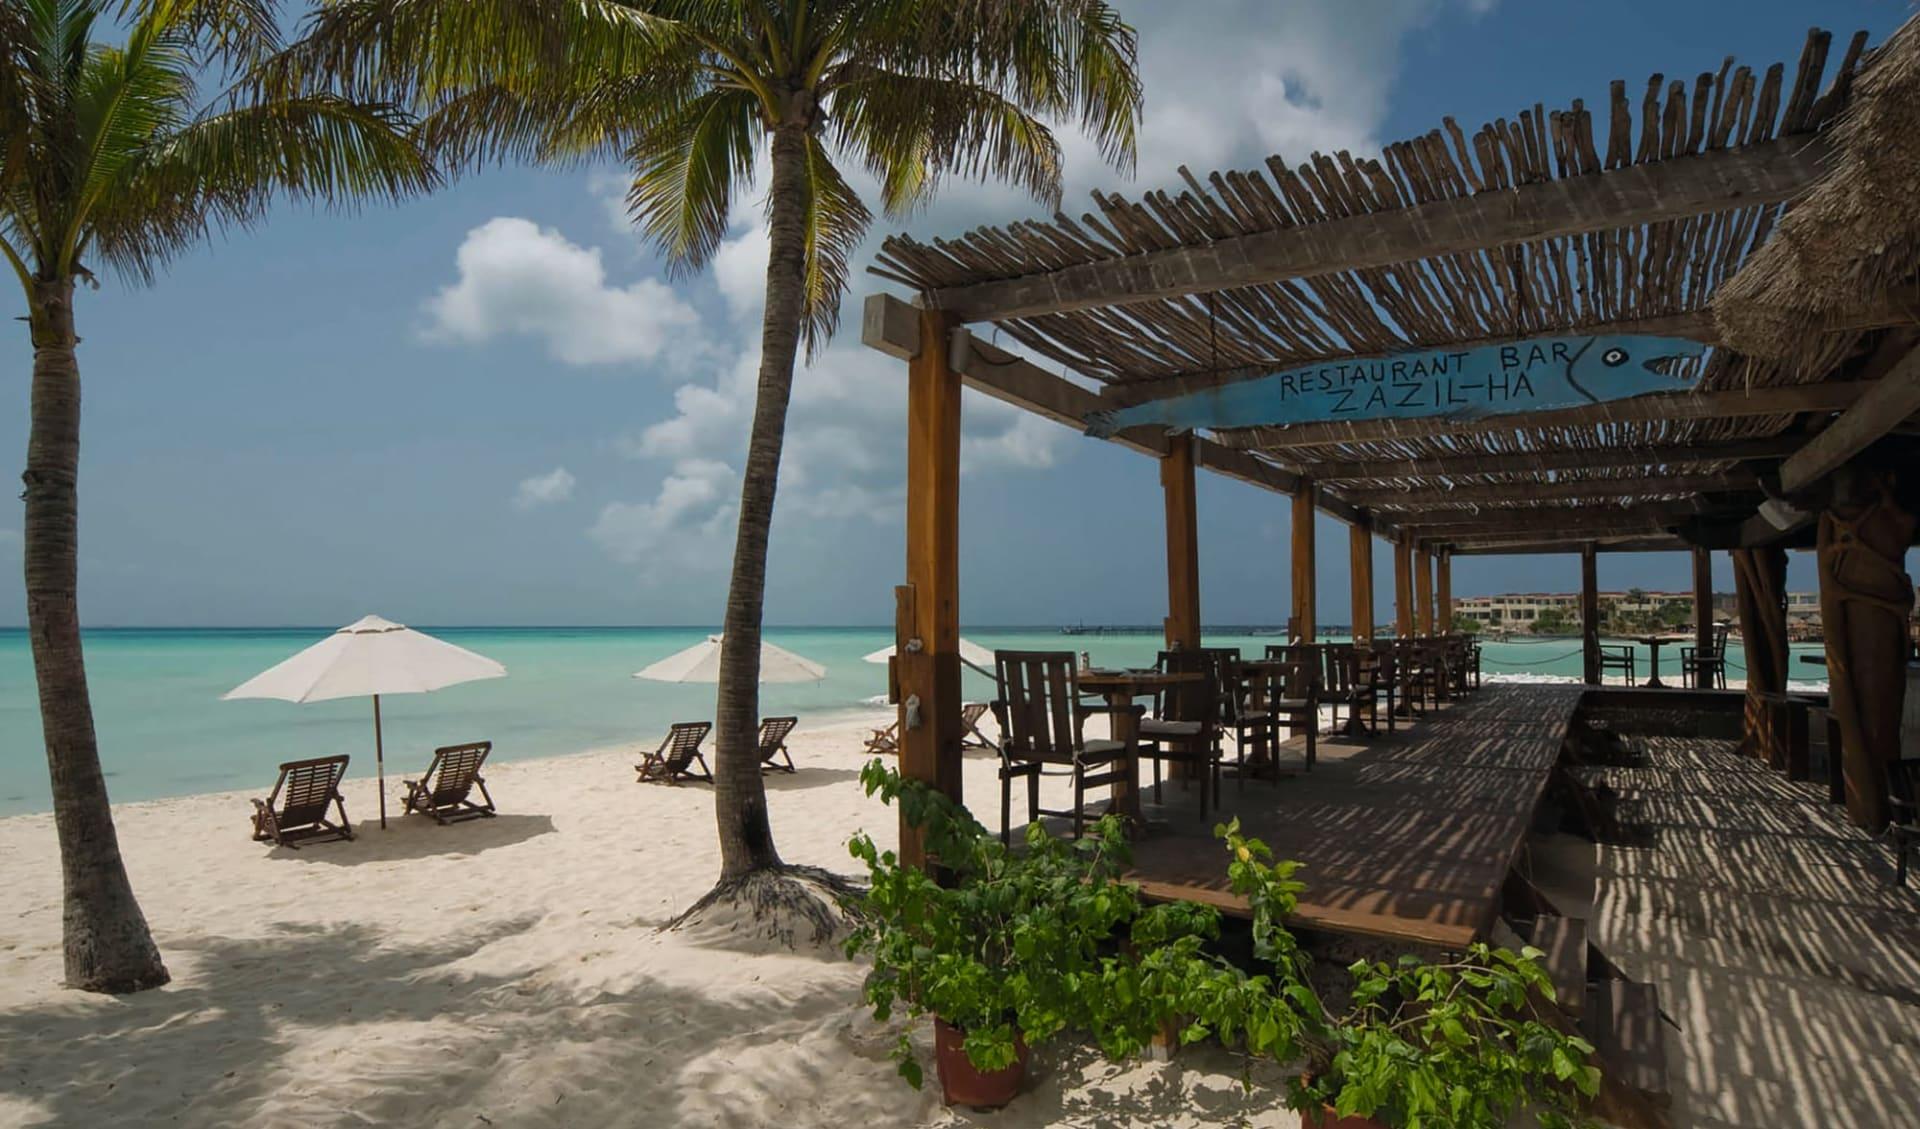 Na Balam Beach Hotel in Isla Mujeres: natur na balam strand meer strandbar